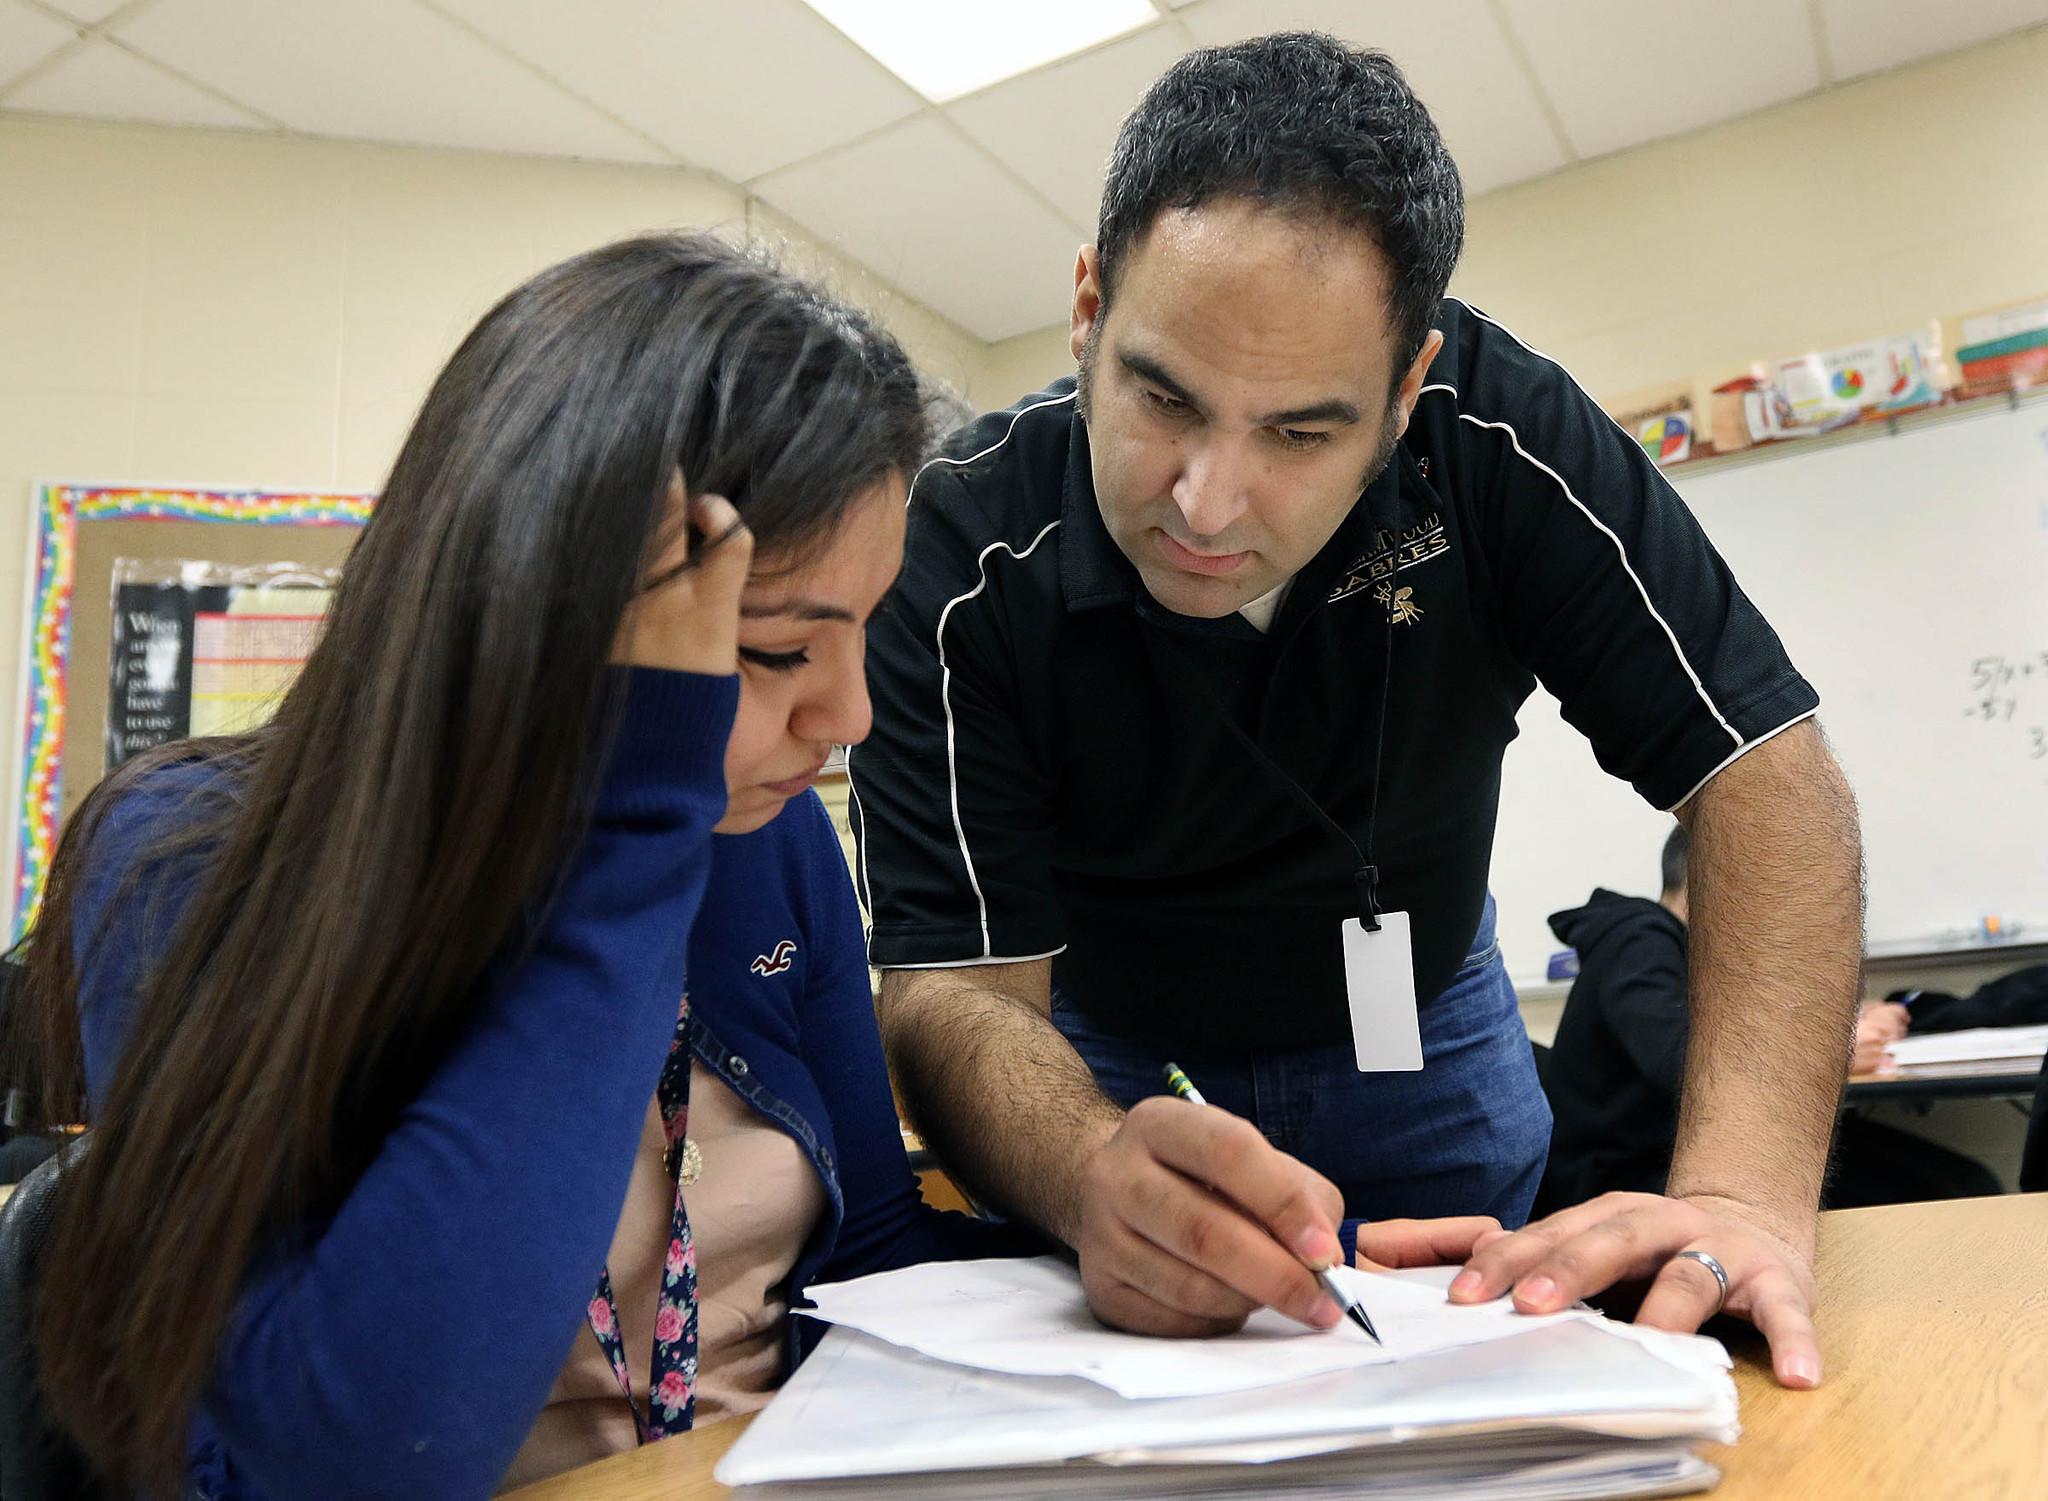 Suburban school districts face challenges diversifying teacher ranks